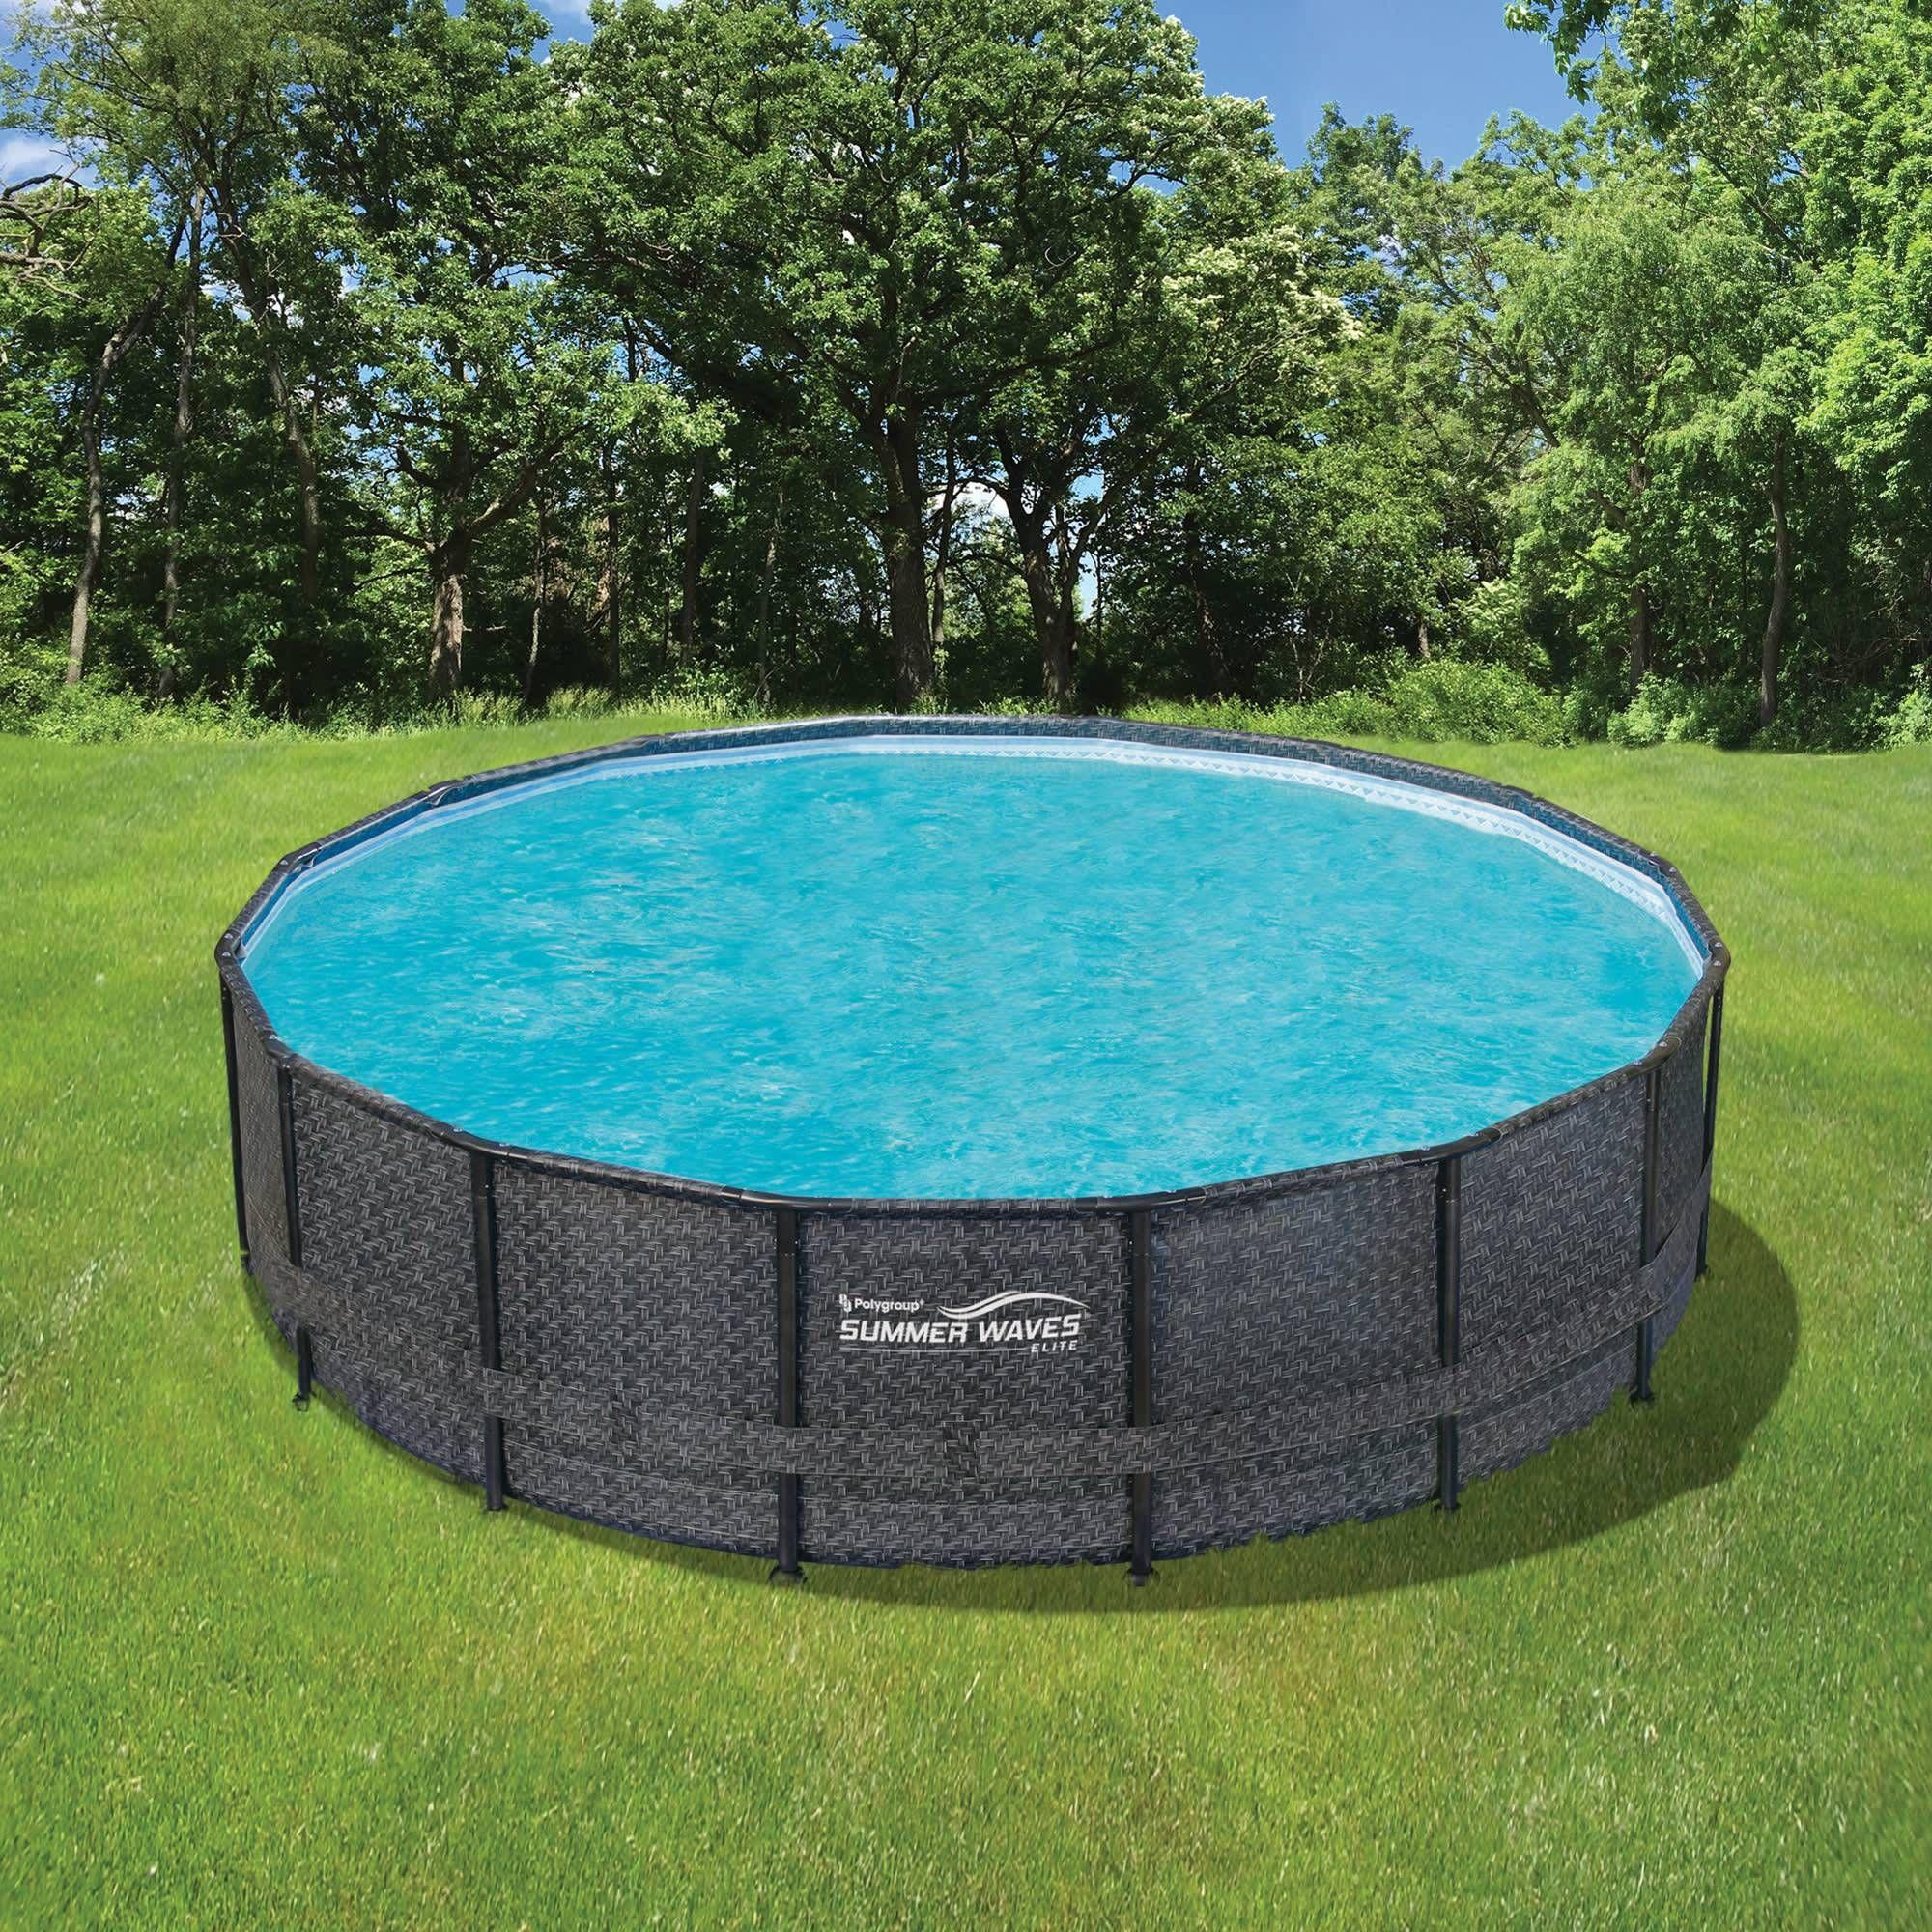 Wicker Metal Frame Pool Package Blue Wave Products Small Above Ground Pool Above Ground Pool Landscaping Homemade Swimming Pools